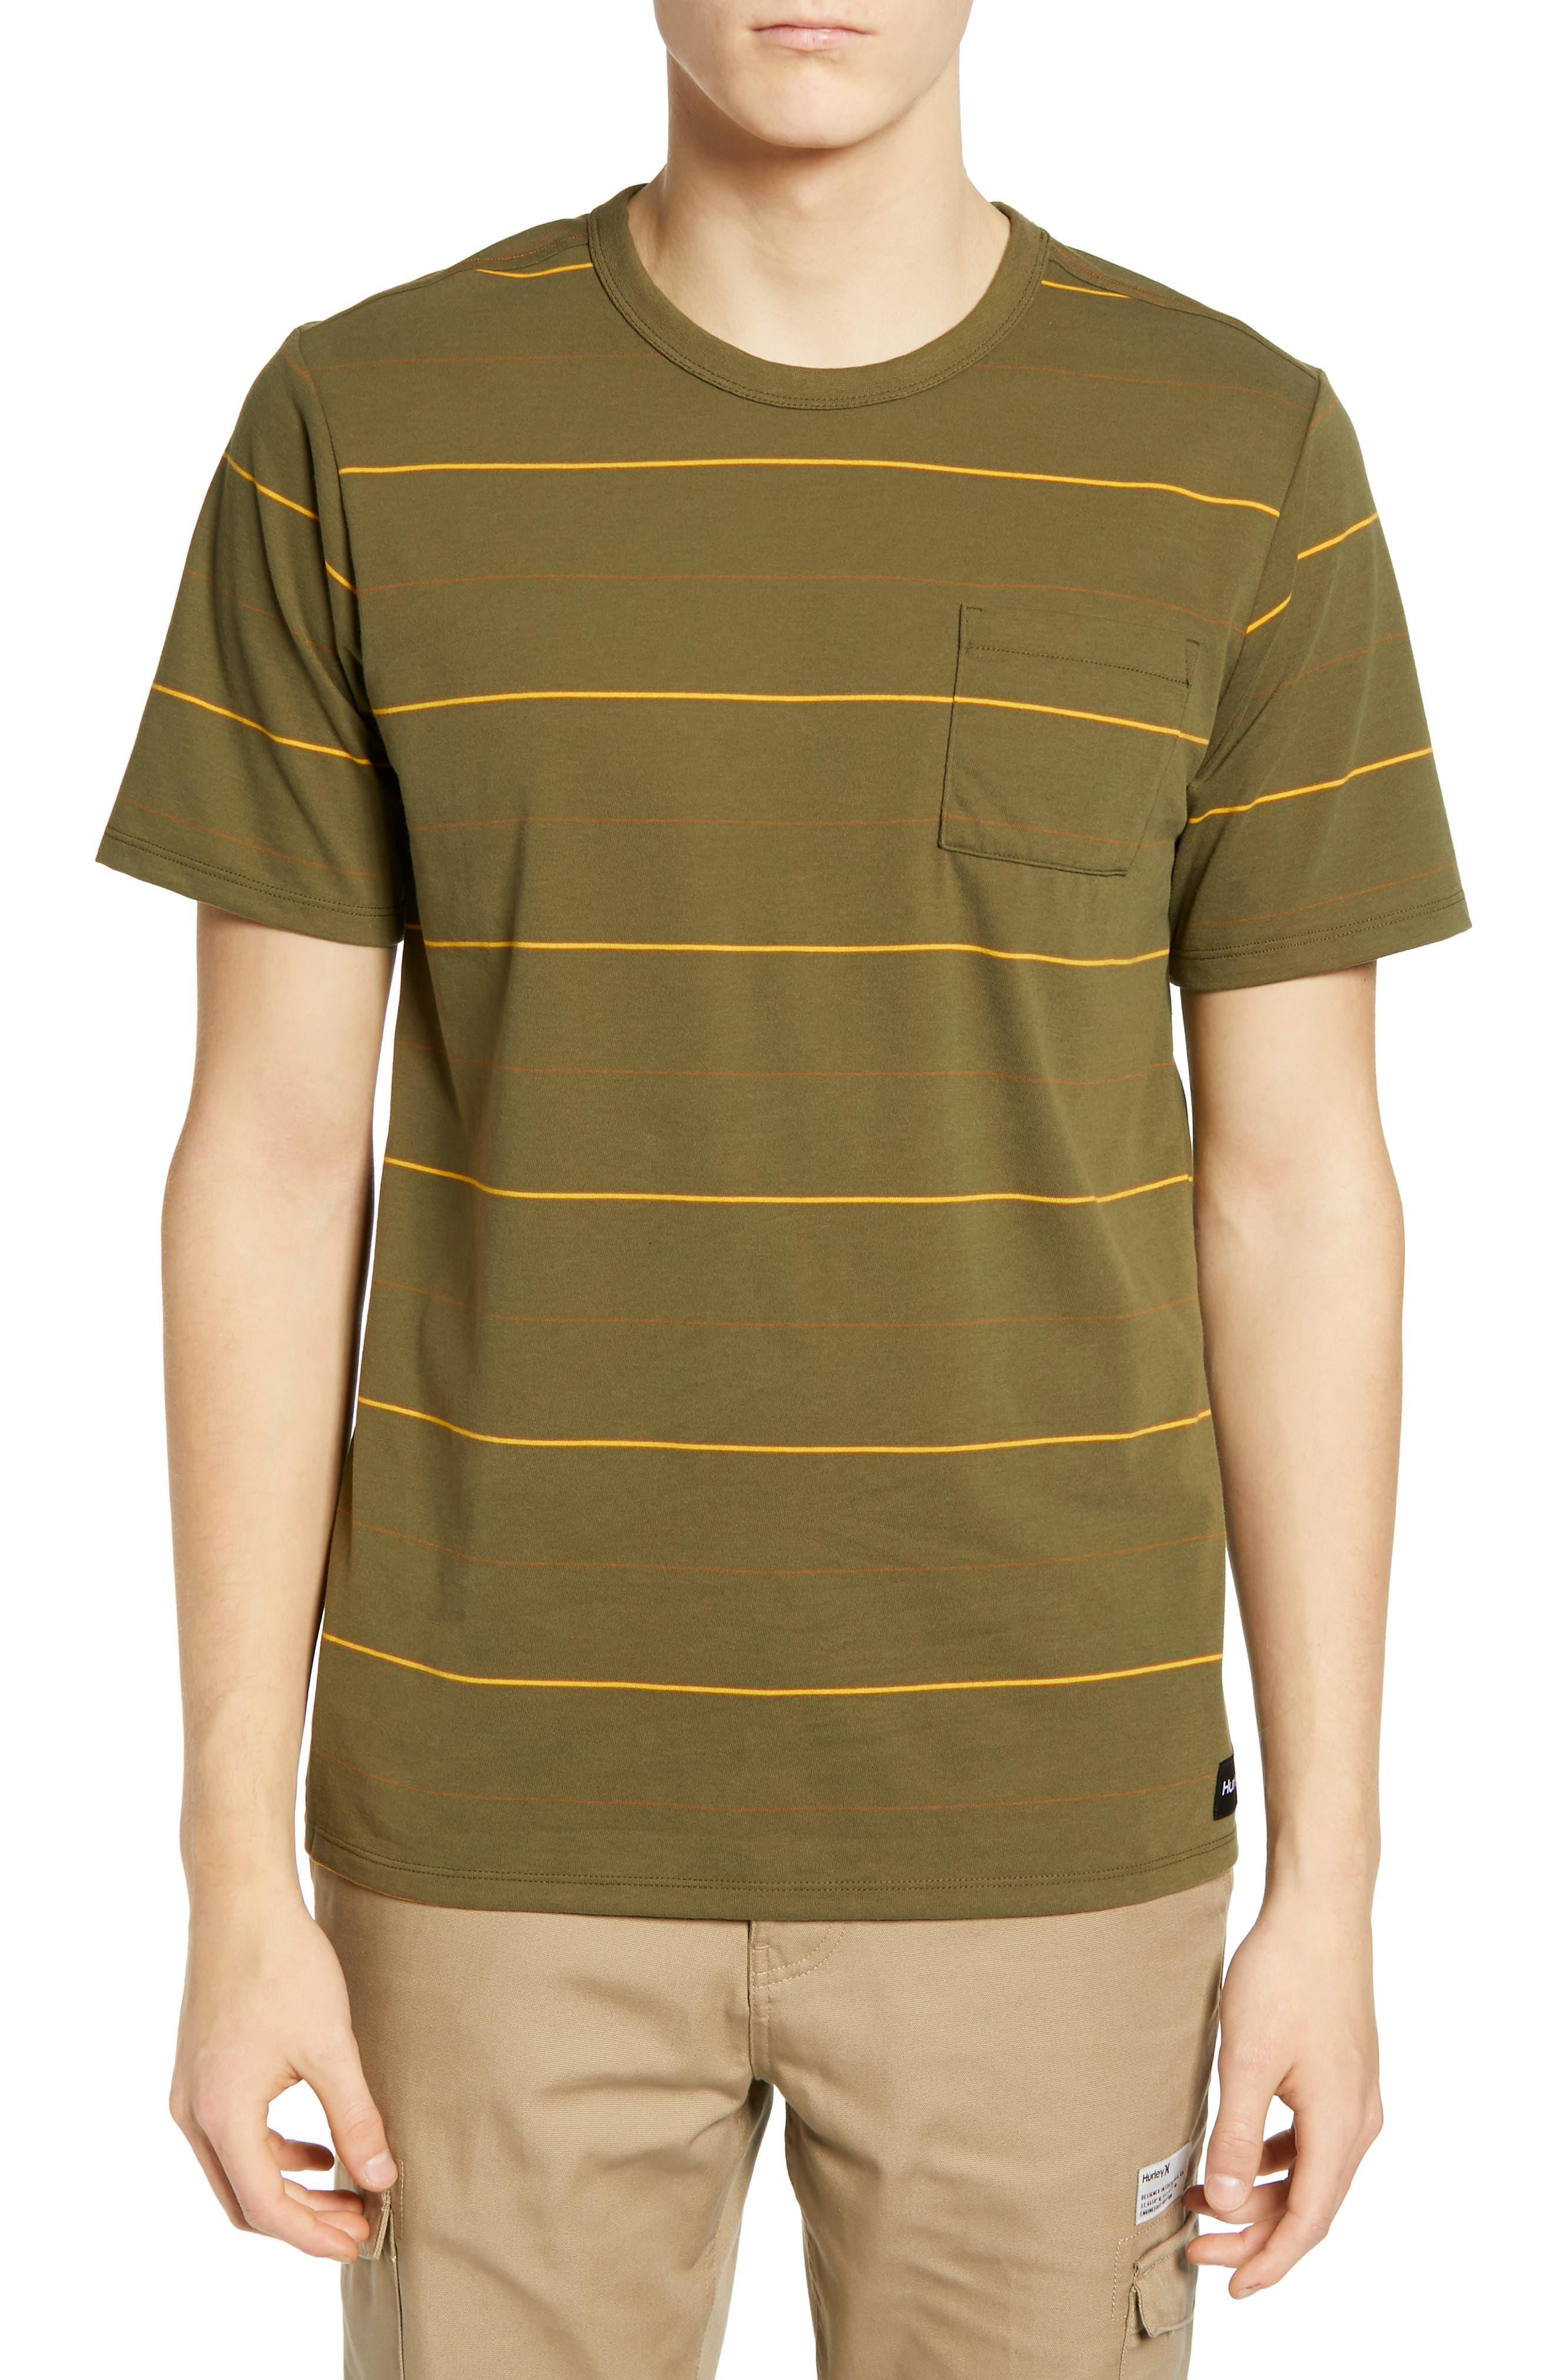 Hurley Dri-Fit Straya Stripe Pocket T-Shirt, Green